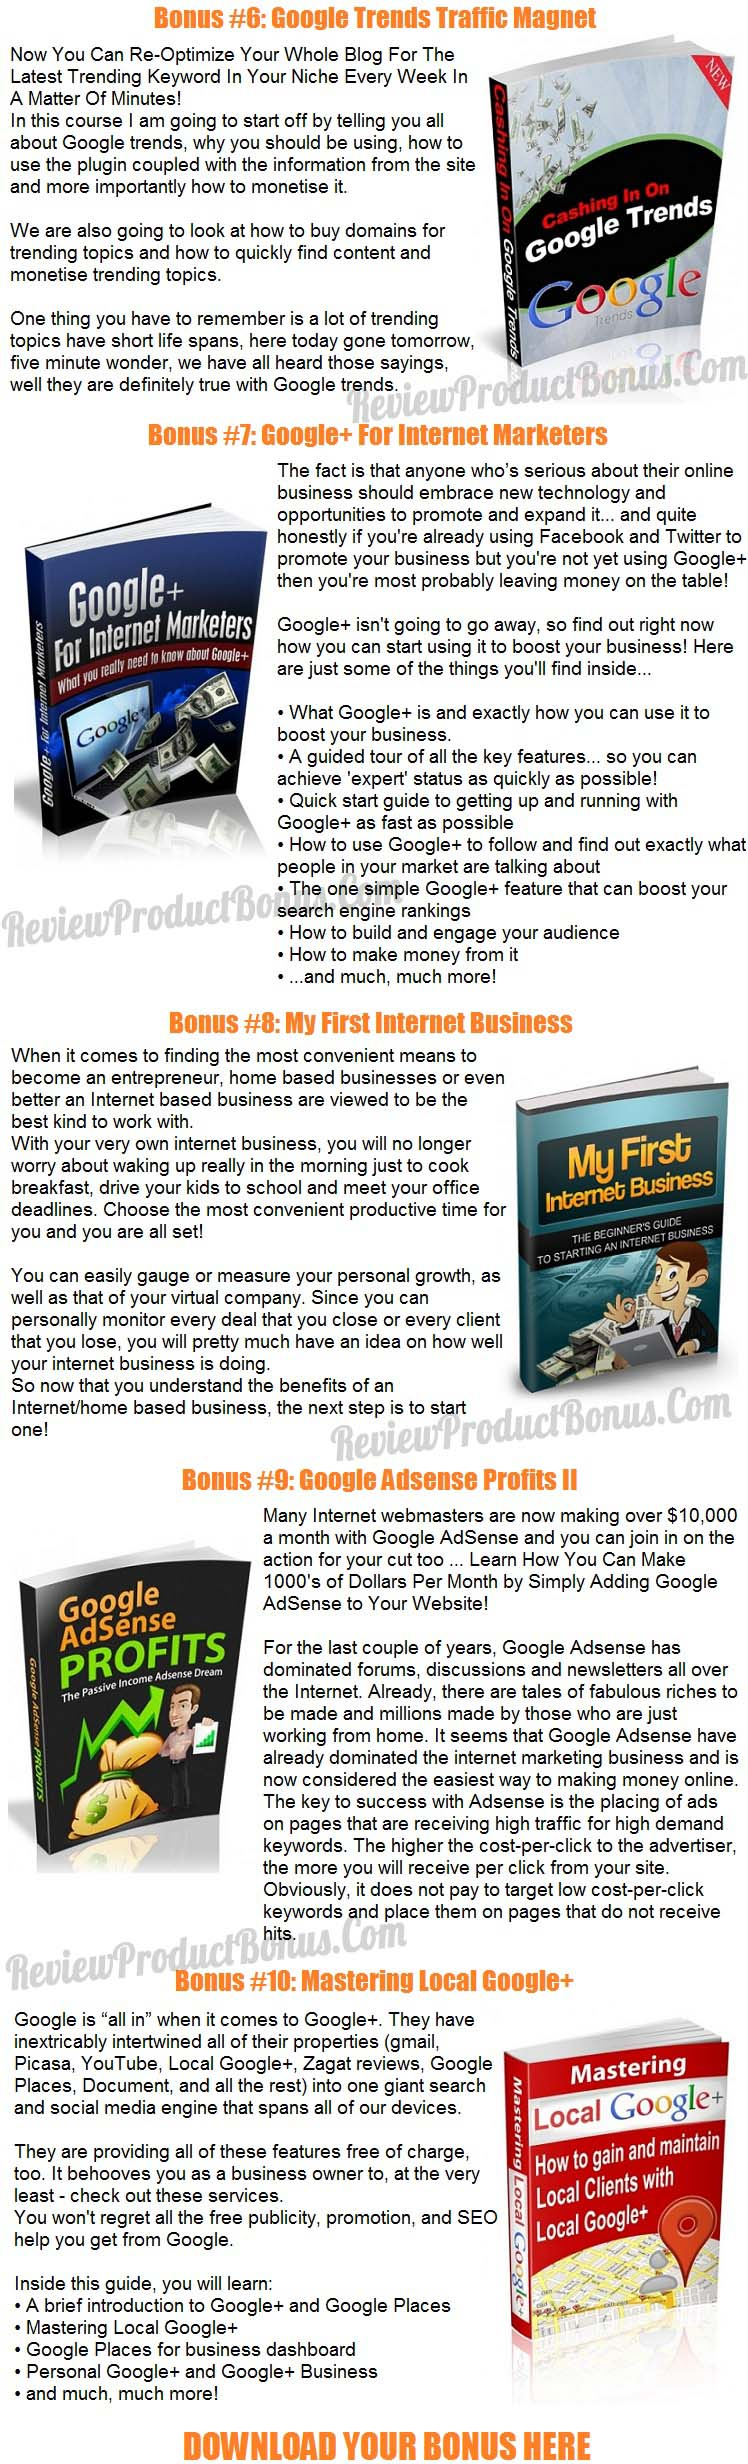 Google My Business Bonuses